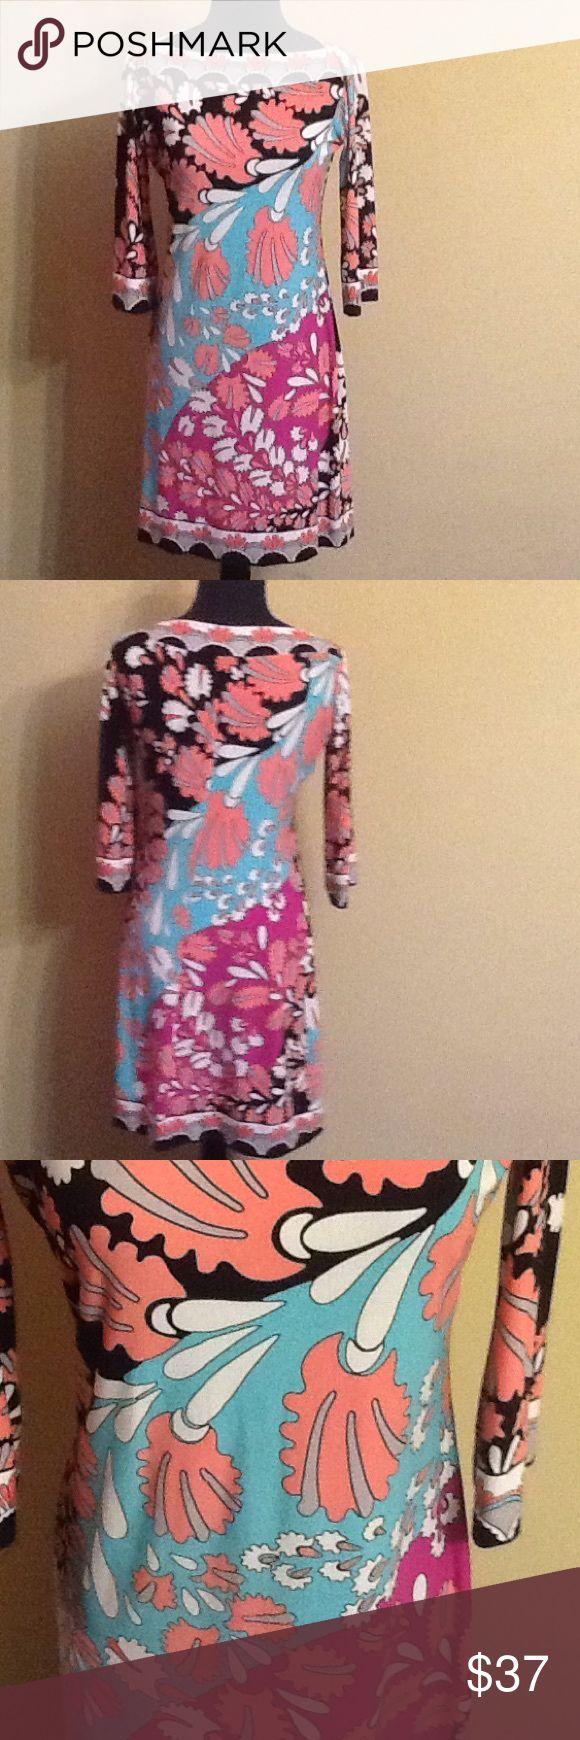 Donna Morgan Donna Morgan sheath dress. Very festive and comfortable! Great condition. Donna Morgan Dresses Midi